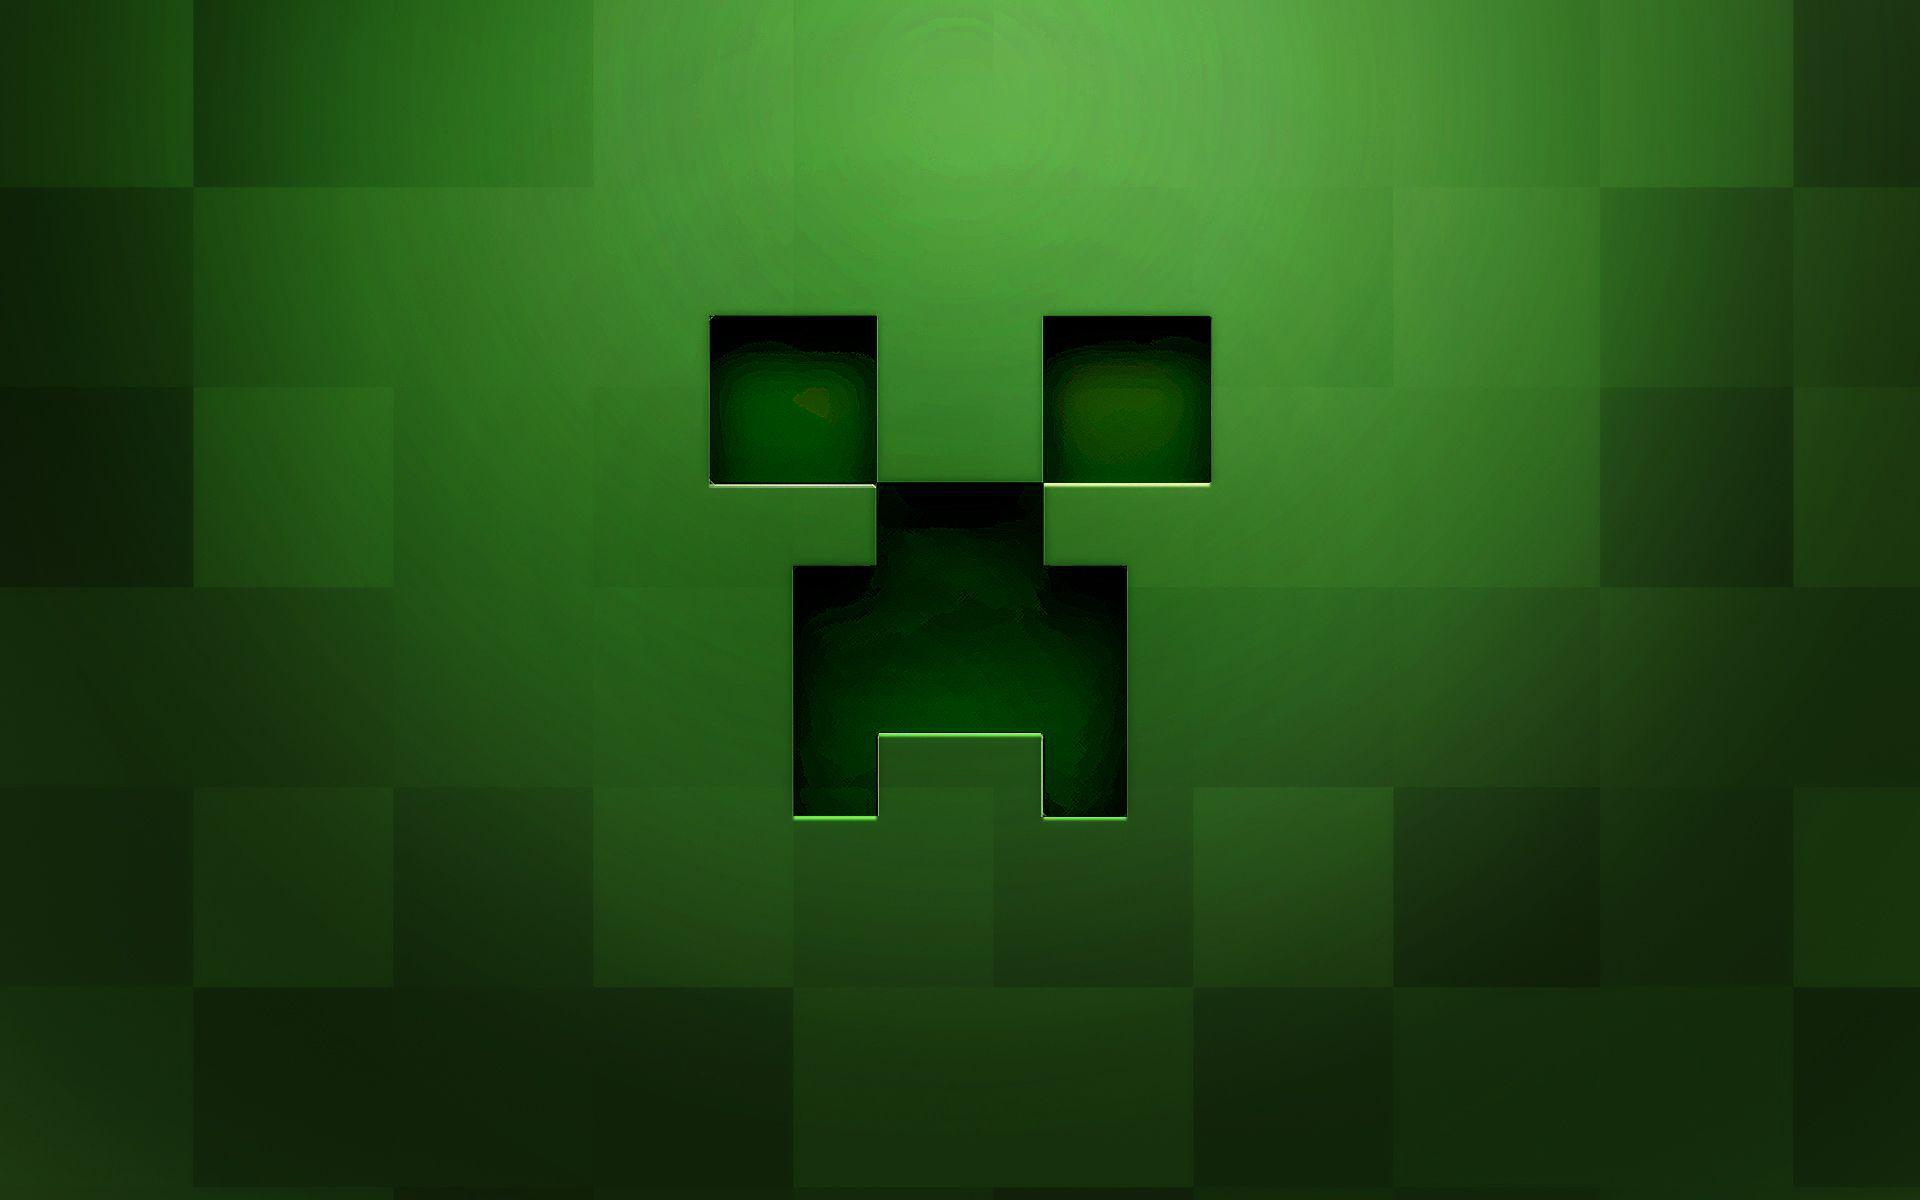 1920x1200 Minecraft Wallpaper 96 Go - Not Go Away